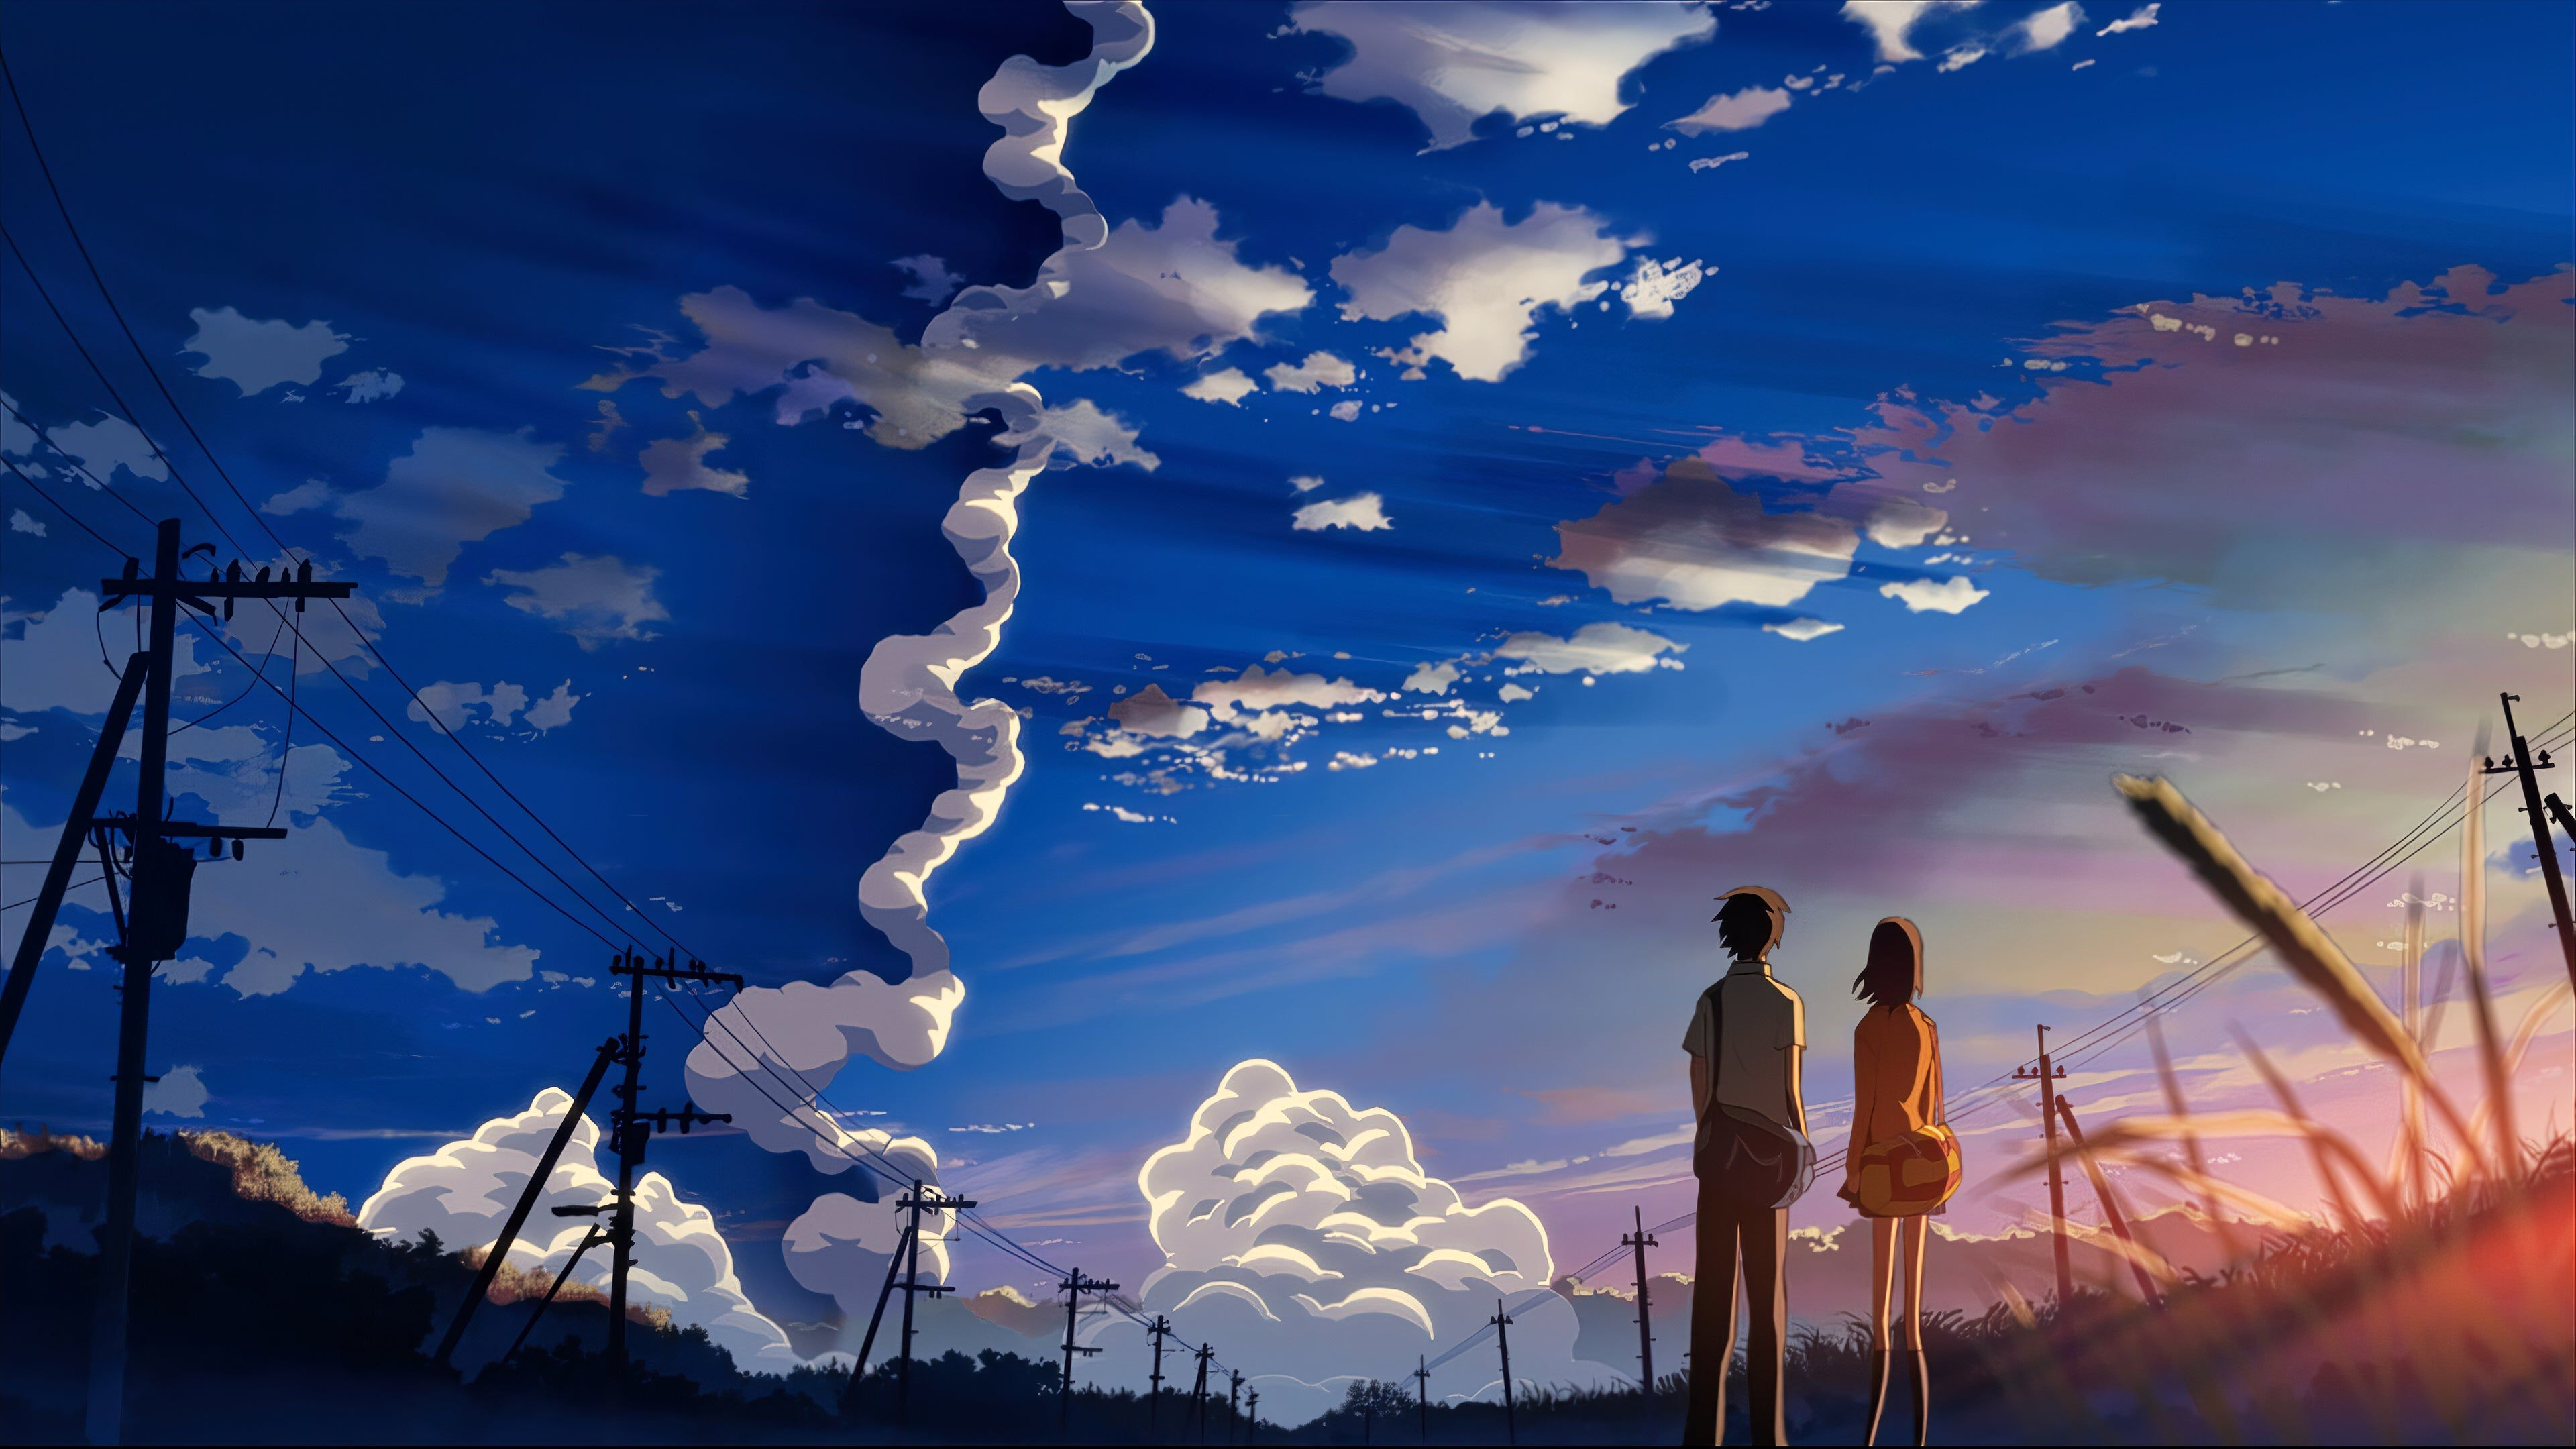 More Rocket Launch 4K wallpaper Anime landschaft